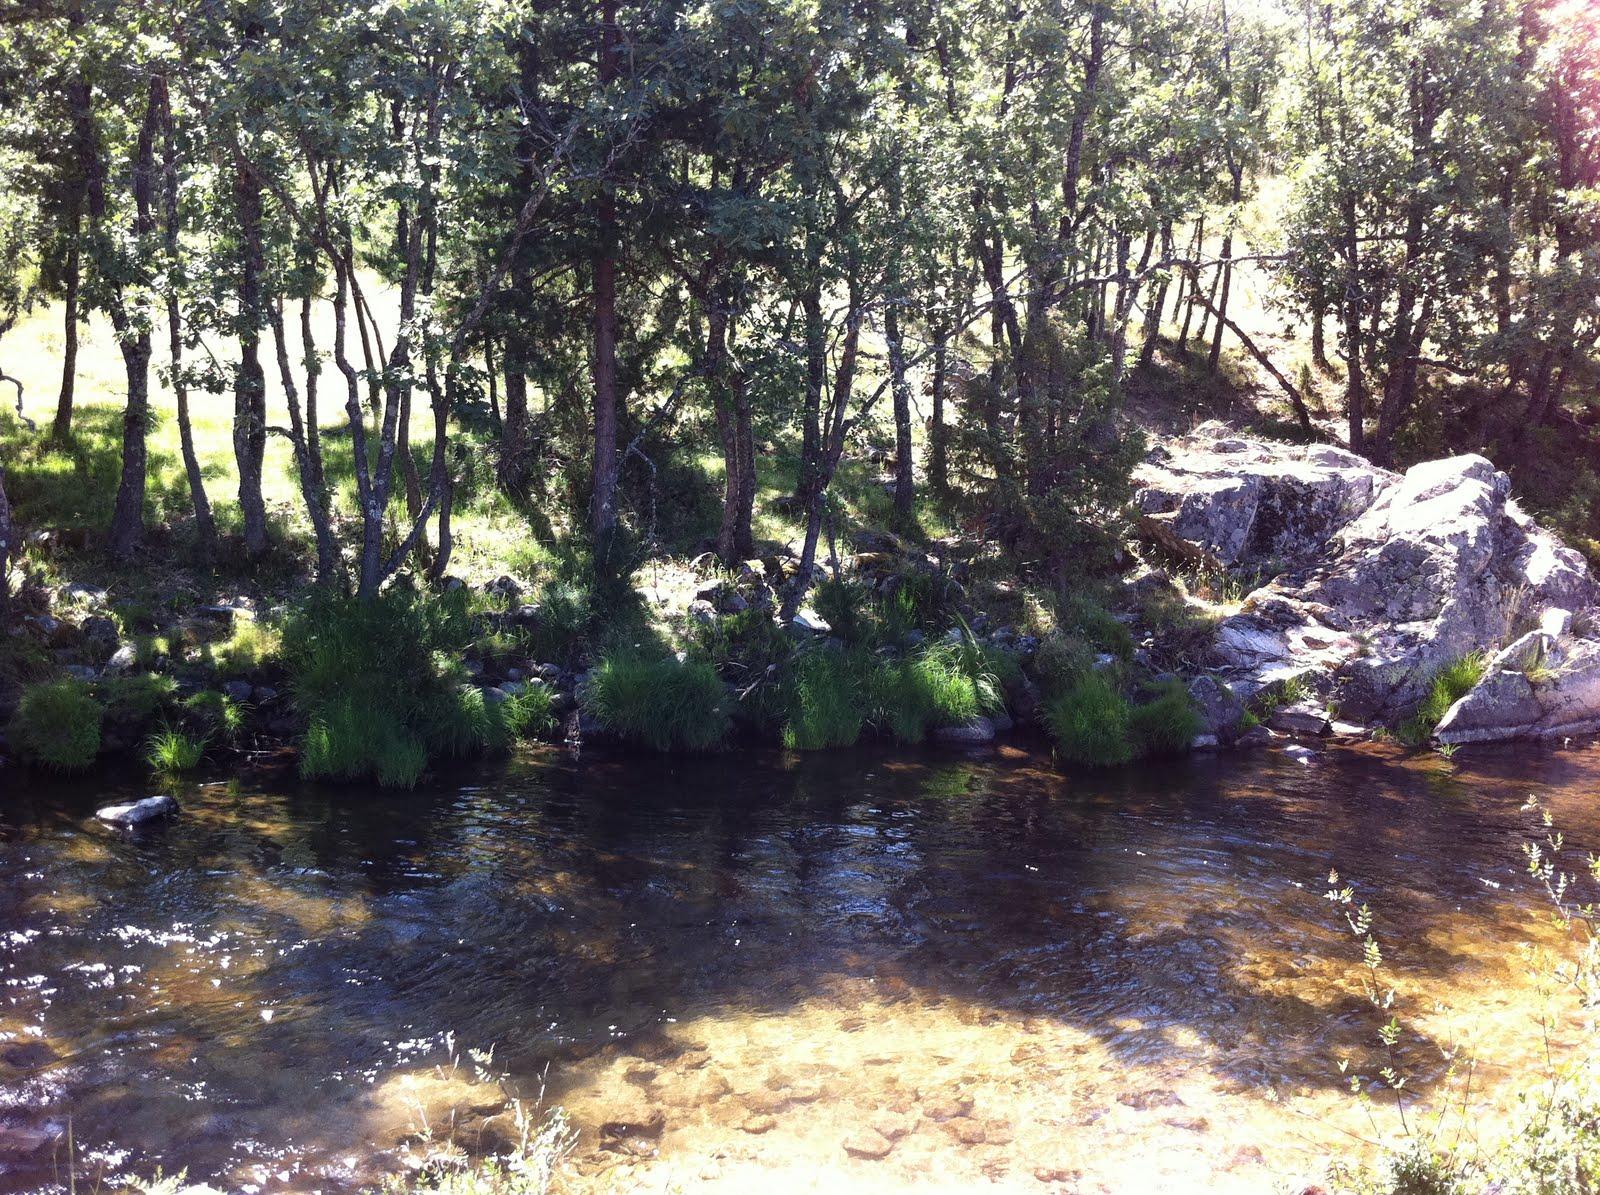 Losaunmasbajitos madrid piscinas naturales las presillas for Piscinas naturales las presillas